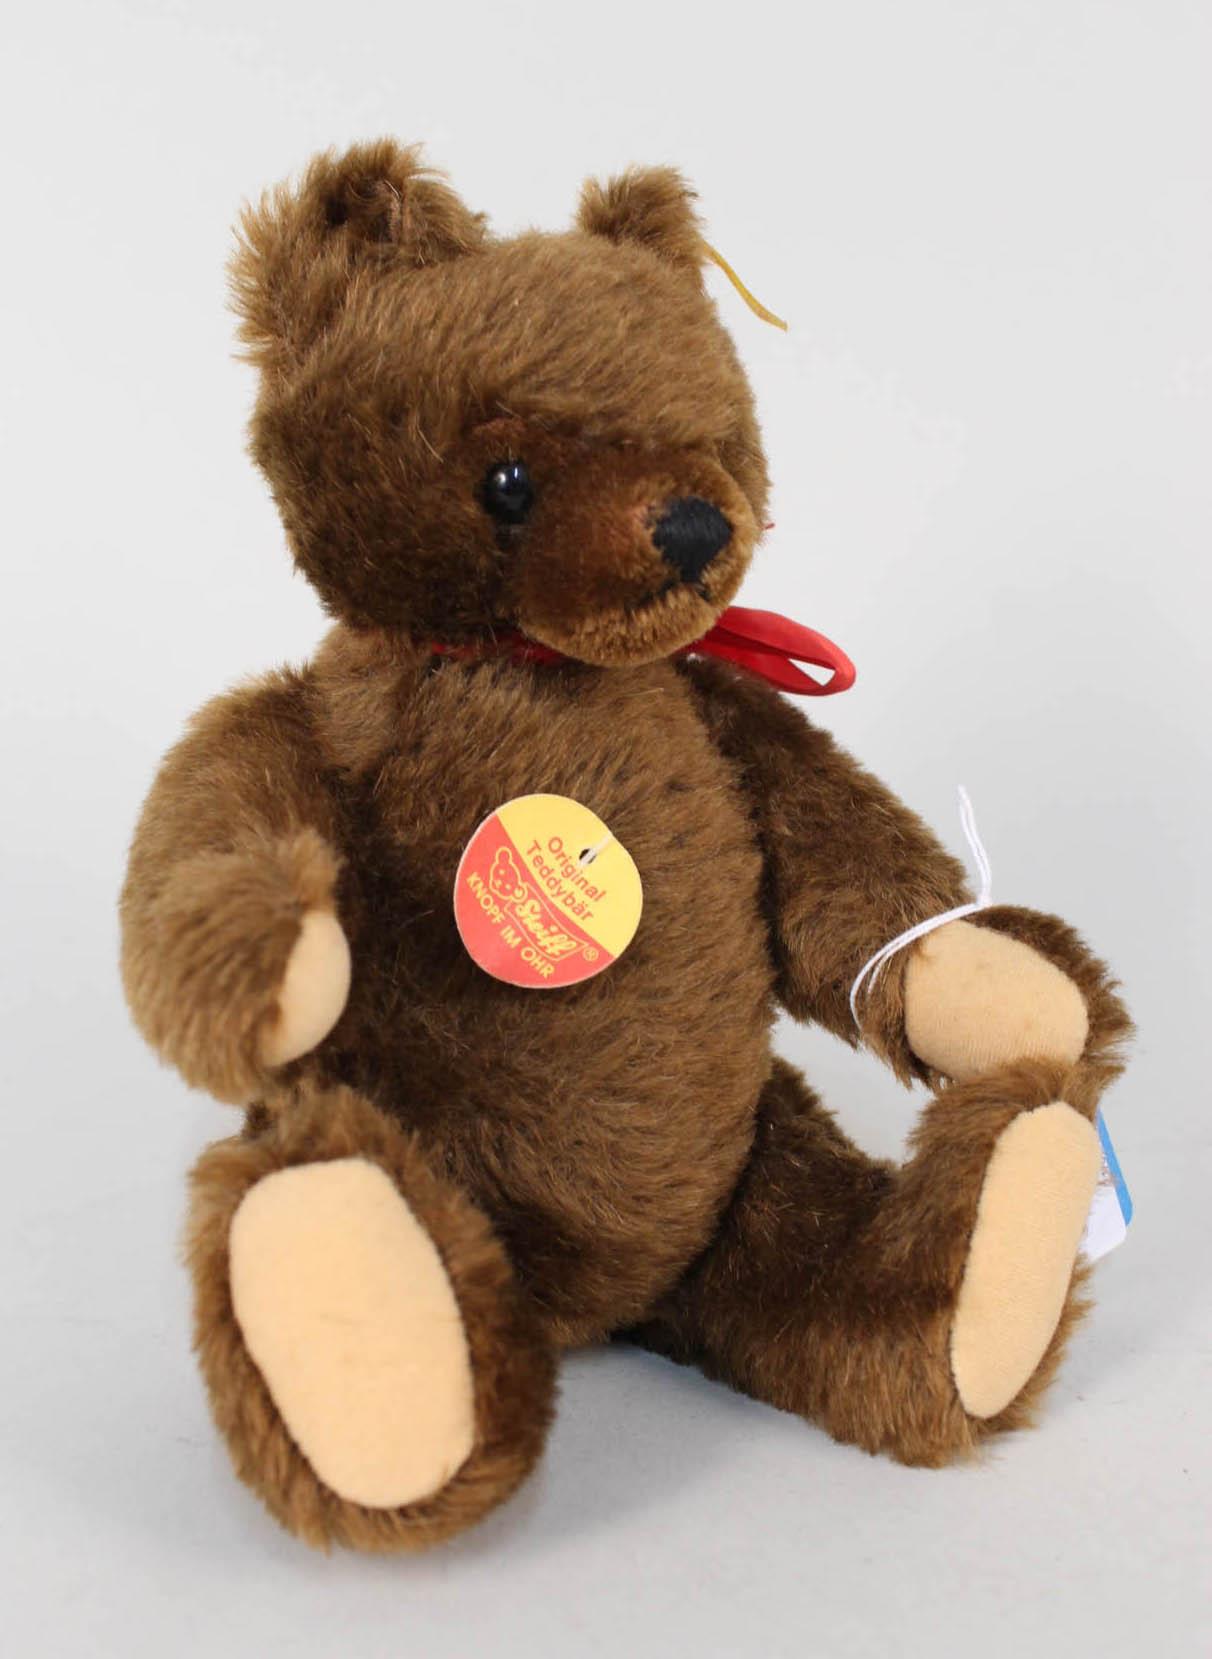 Lot 54 - A Steiff brown original teddy bear